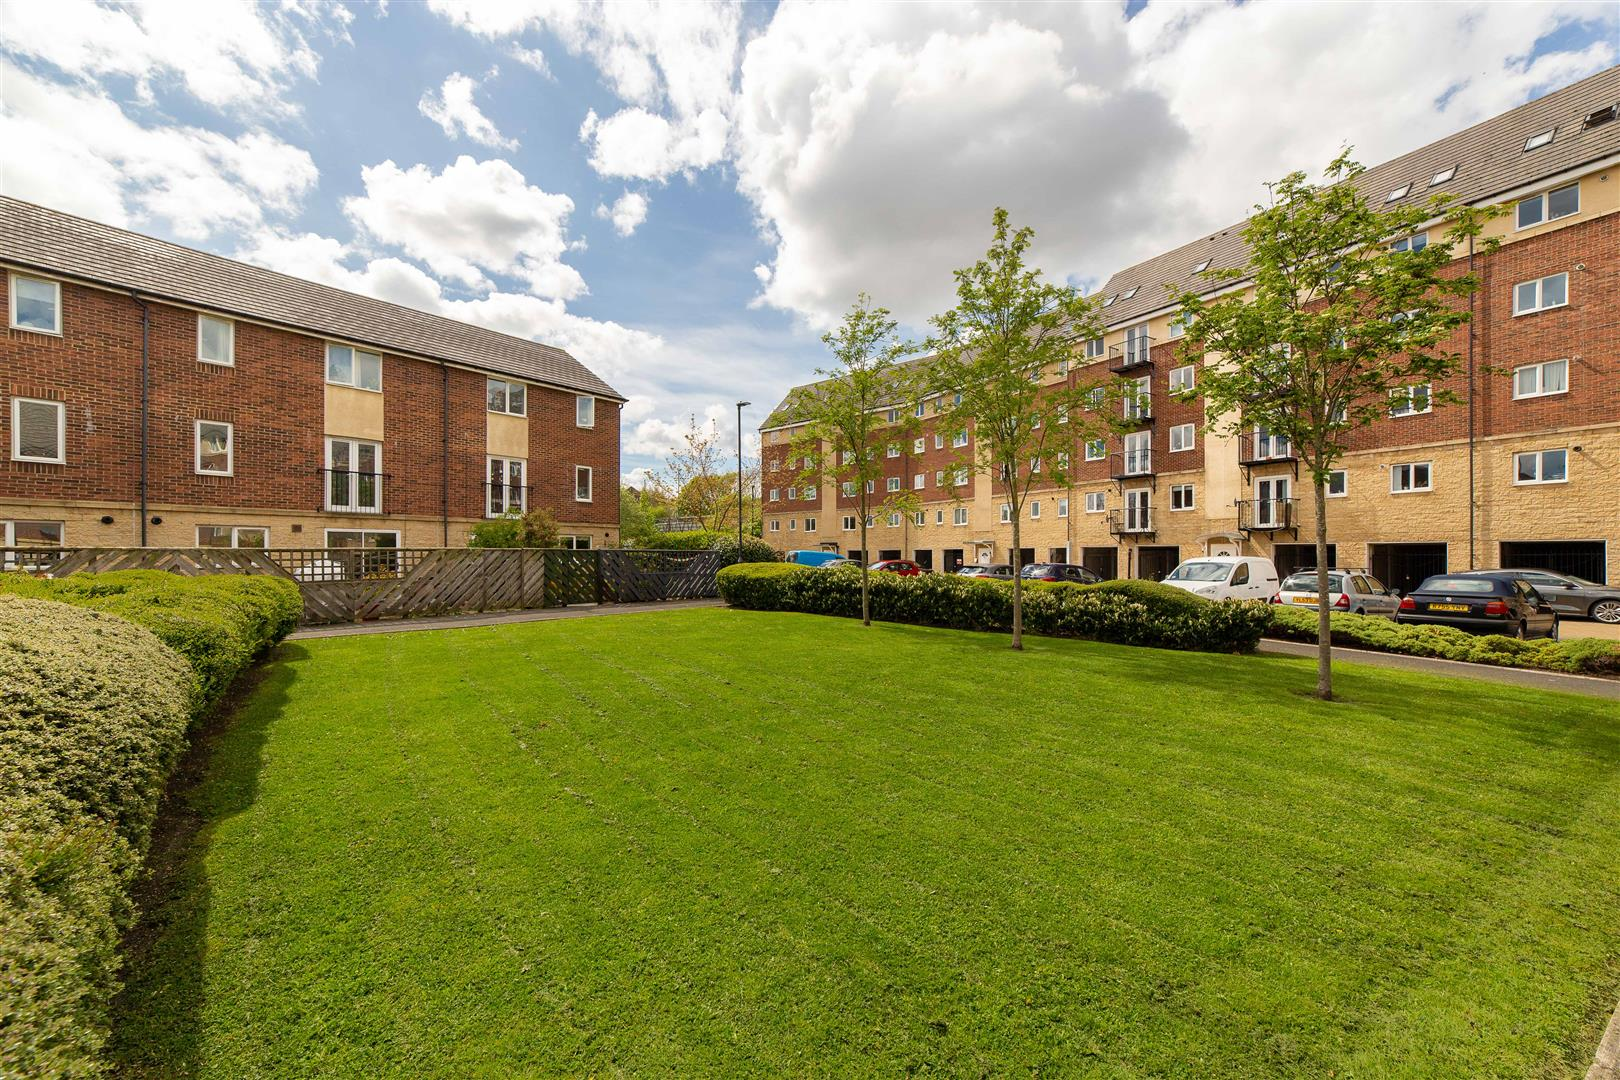 2 bed apartment for sale in Chillingham Road, Heaton, NE6